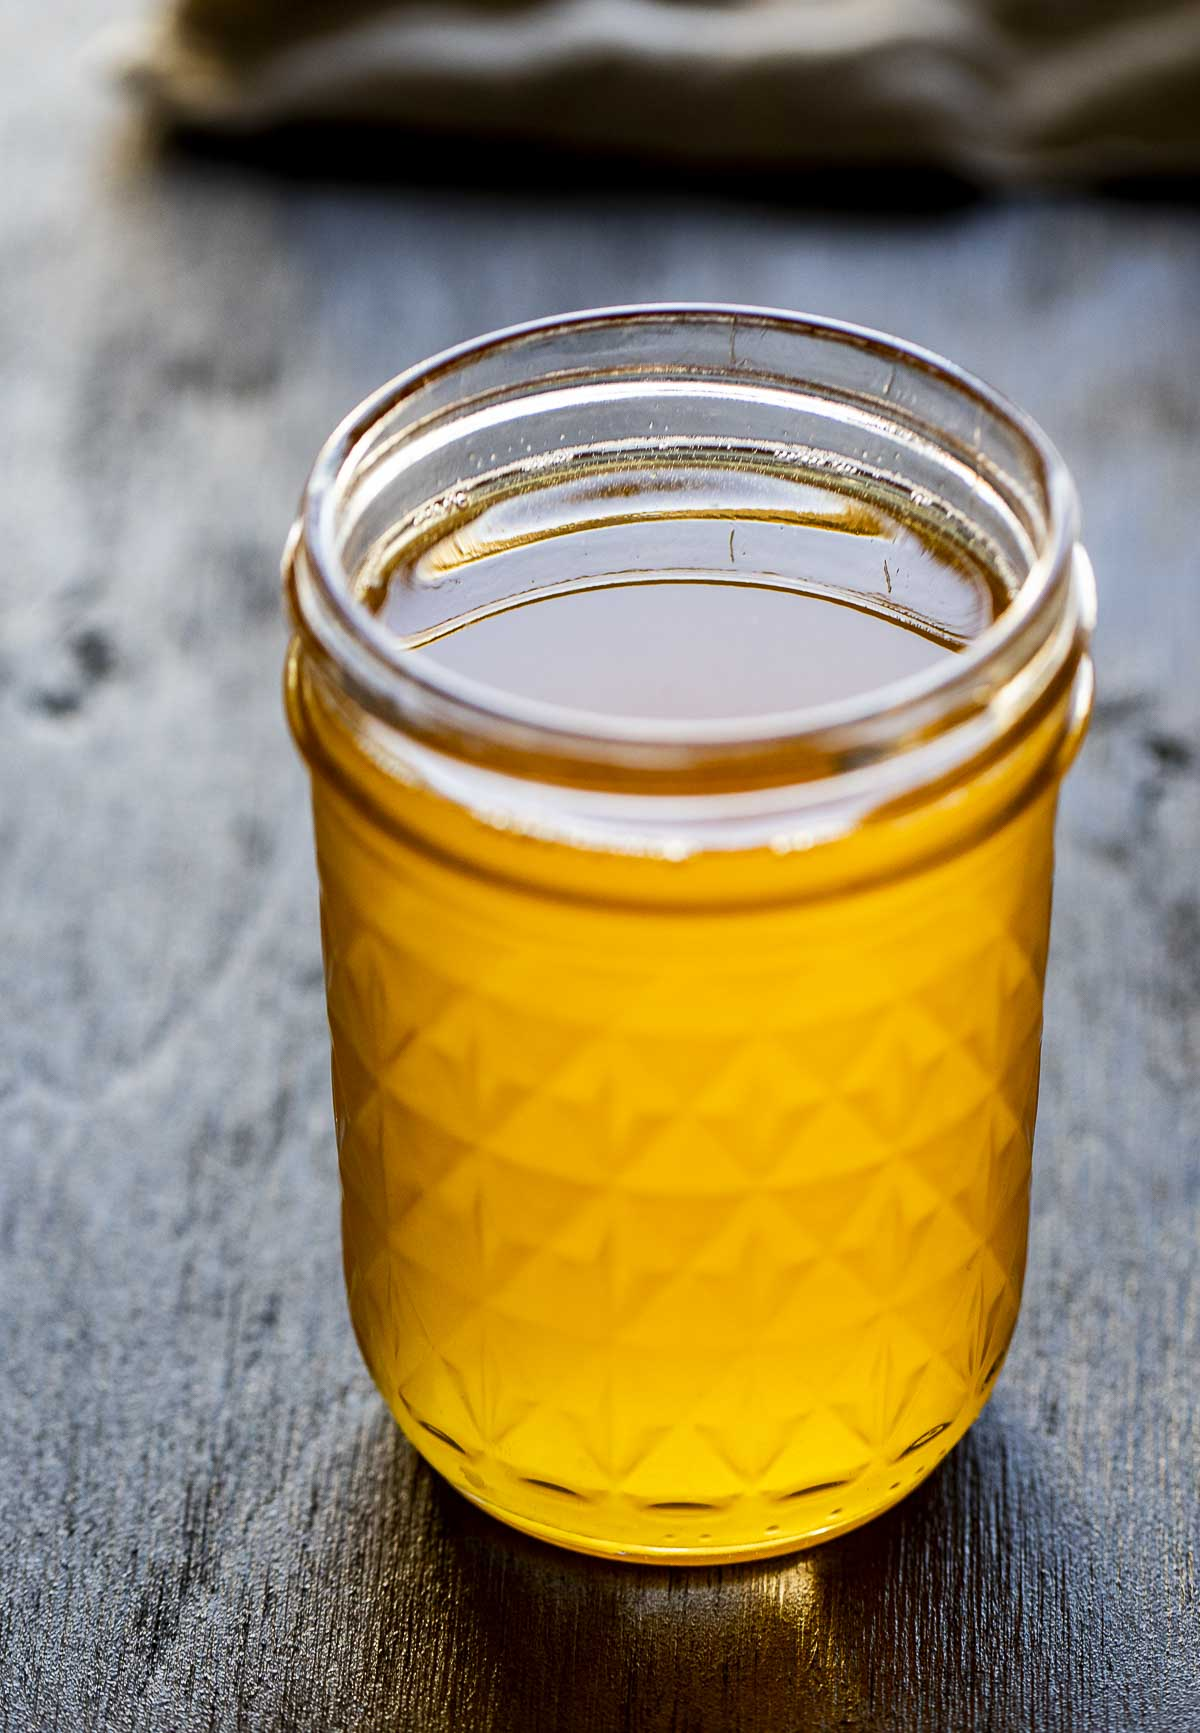 liquid ghee in a glass jar